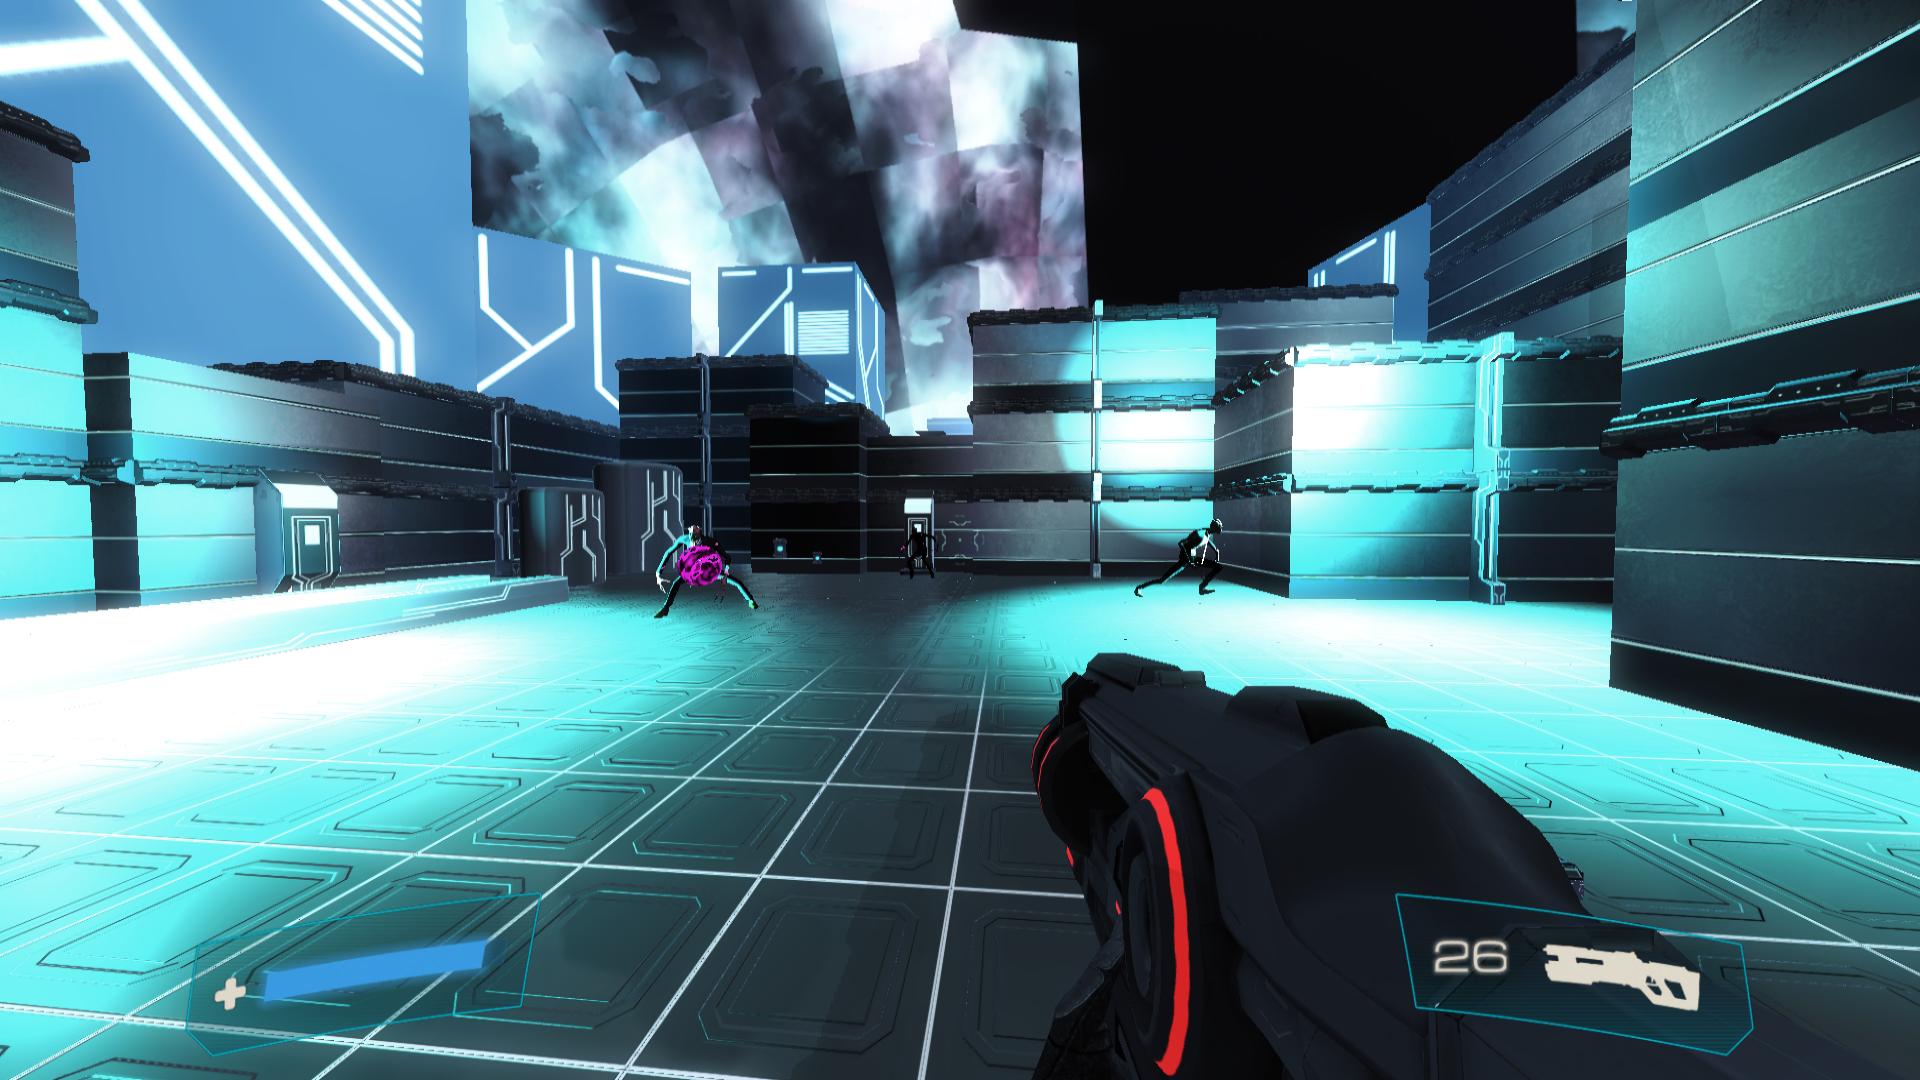 Screenshot 2.png